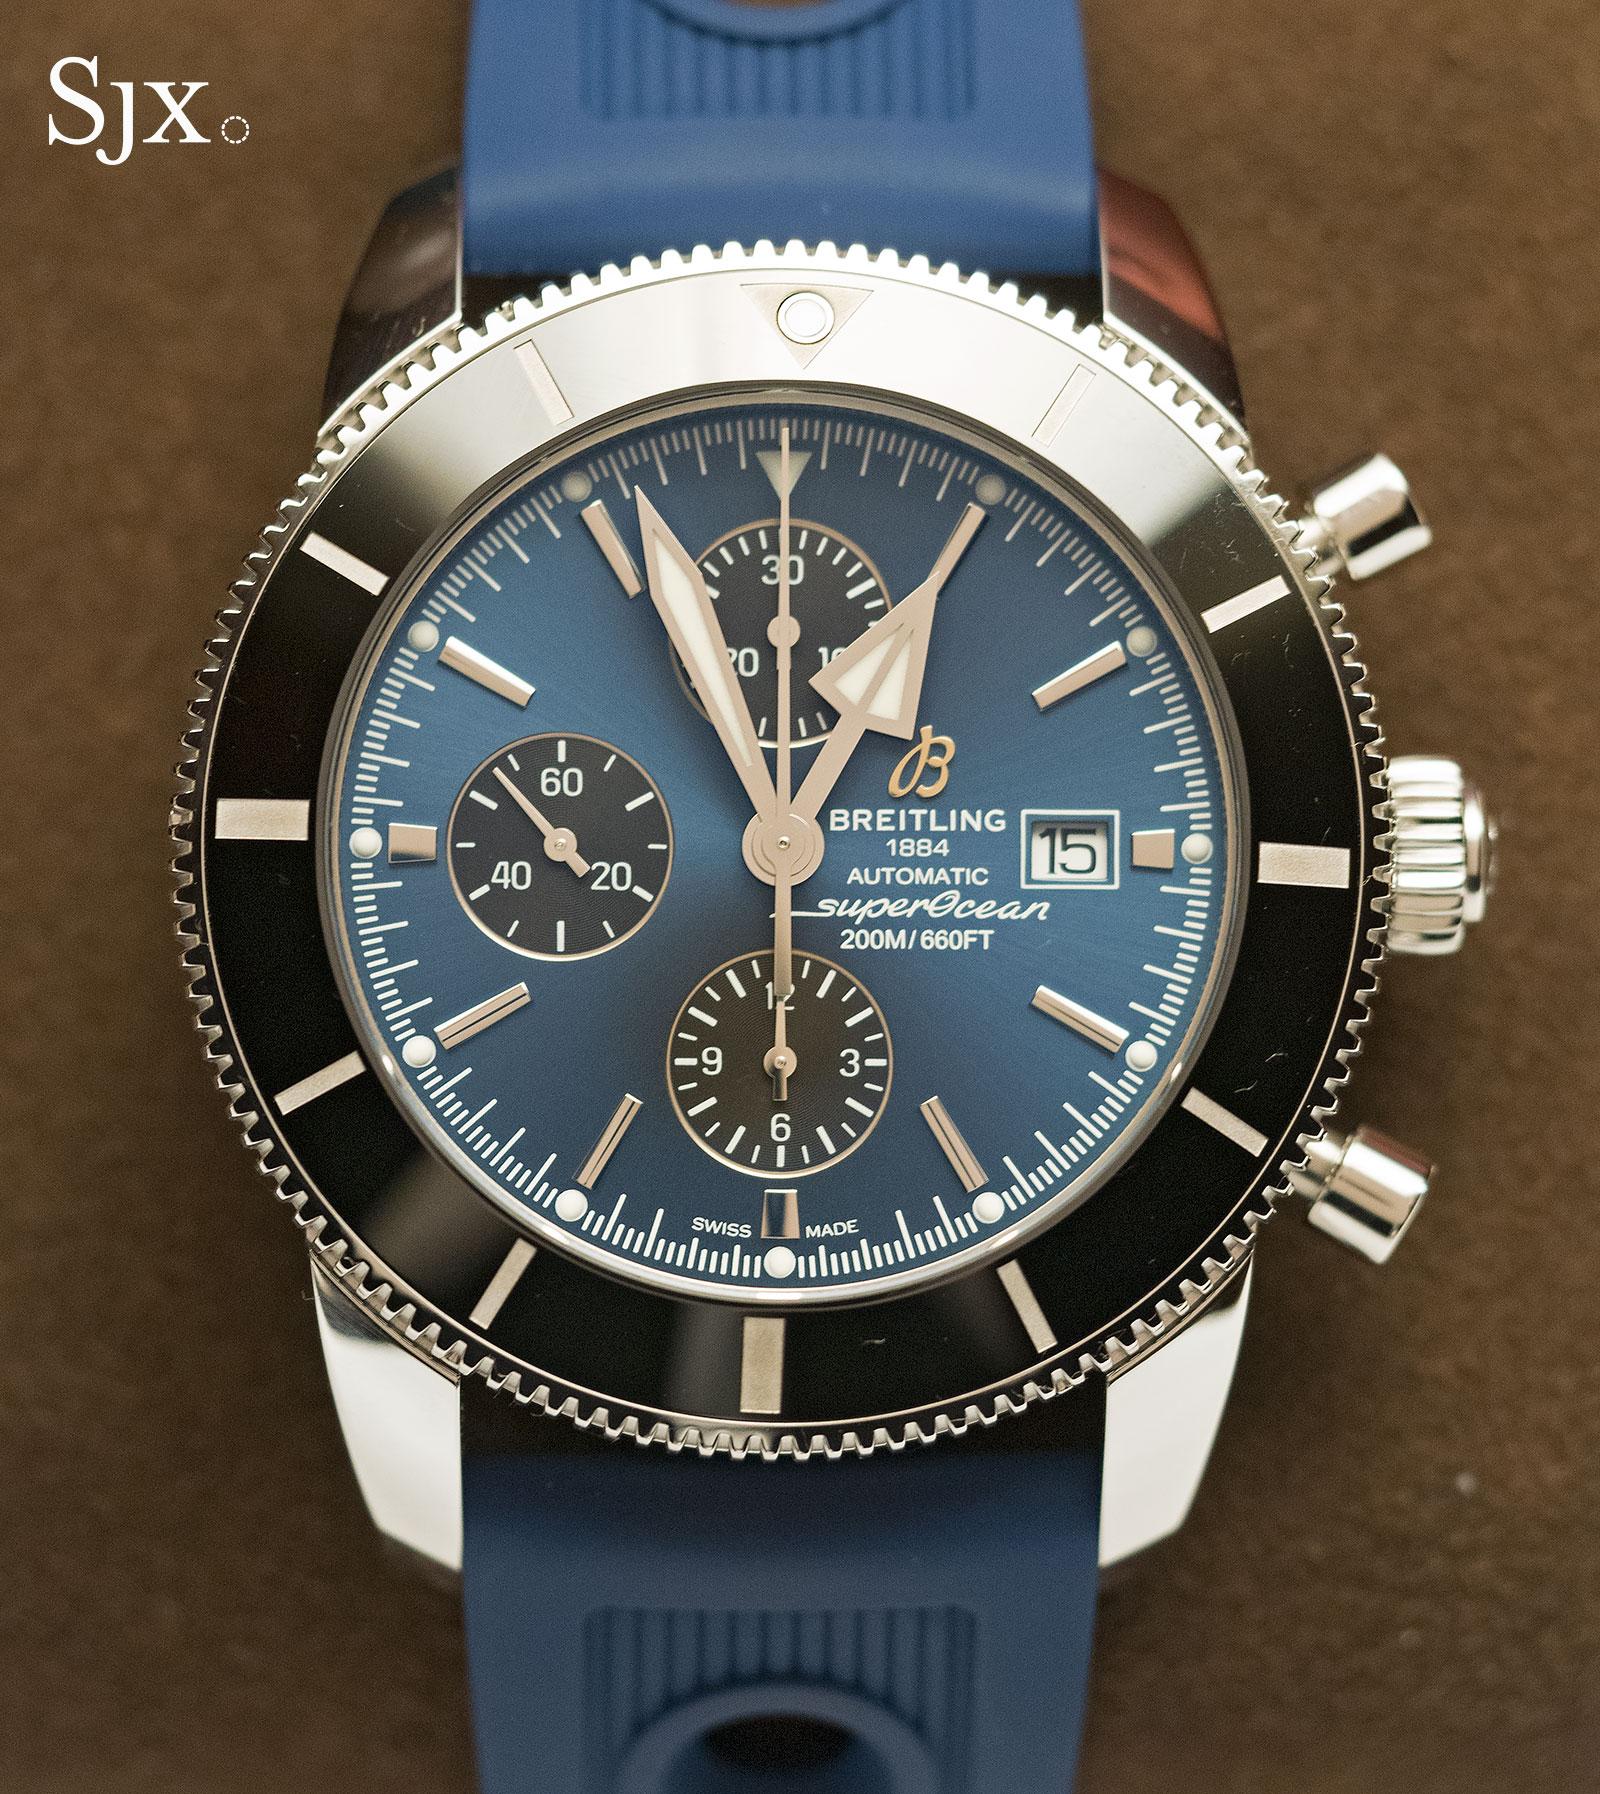 Breitling Superocean II Chronograph 46